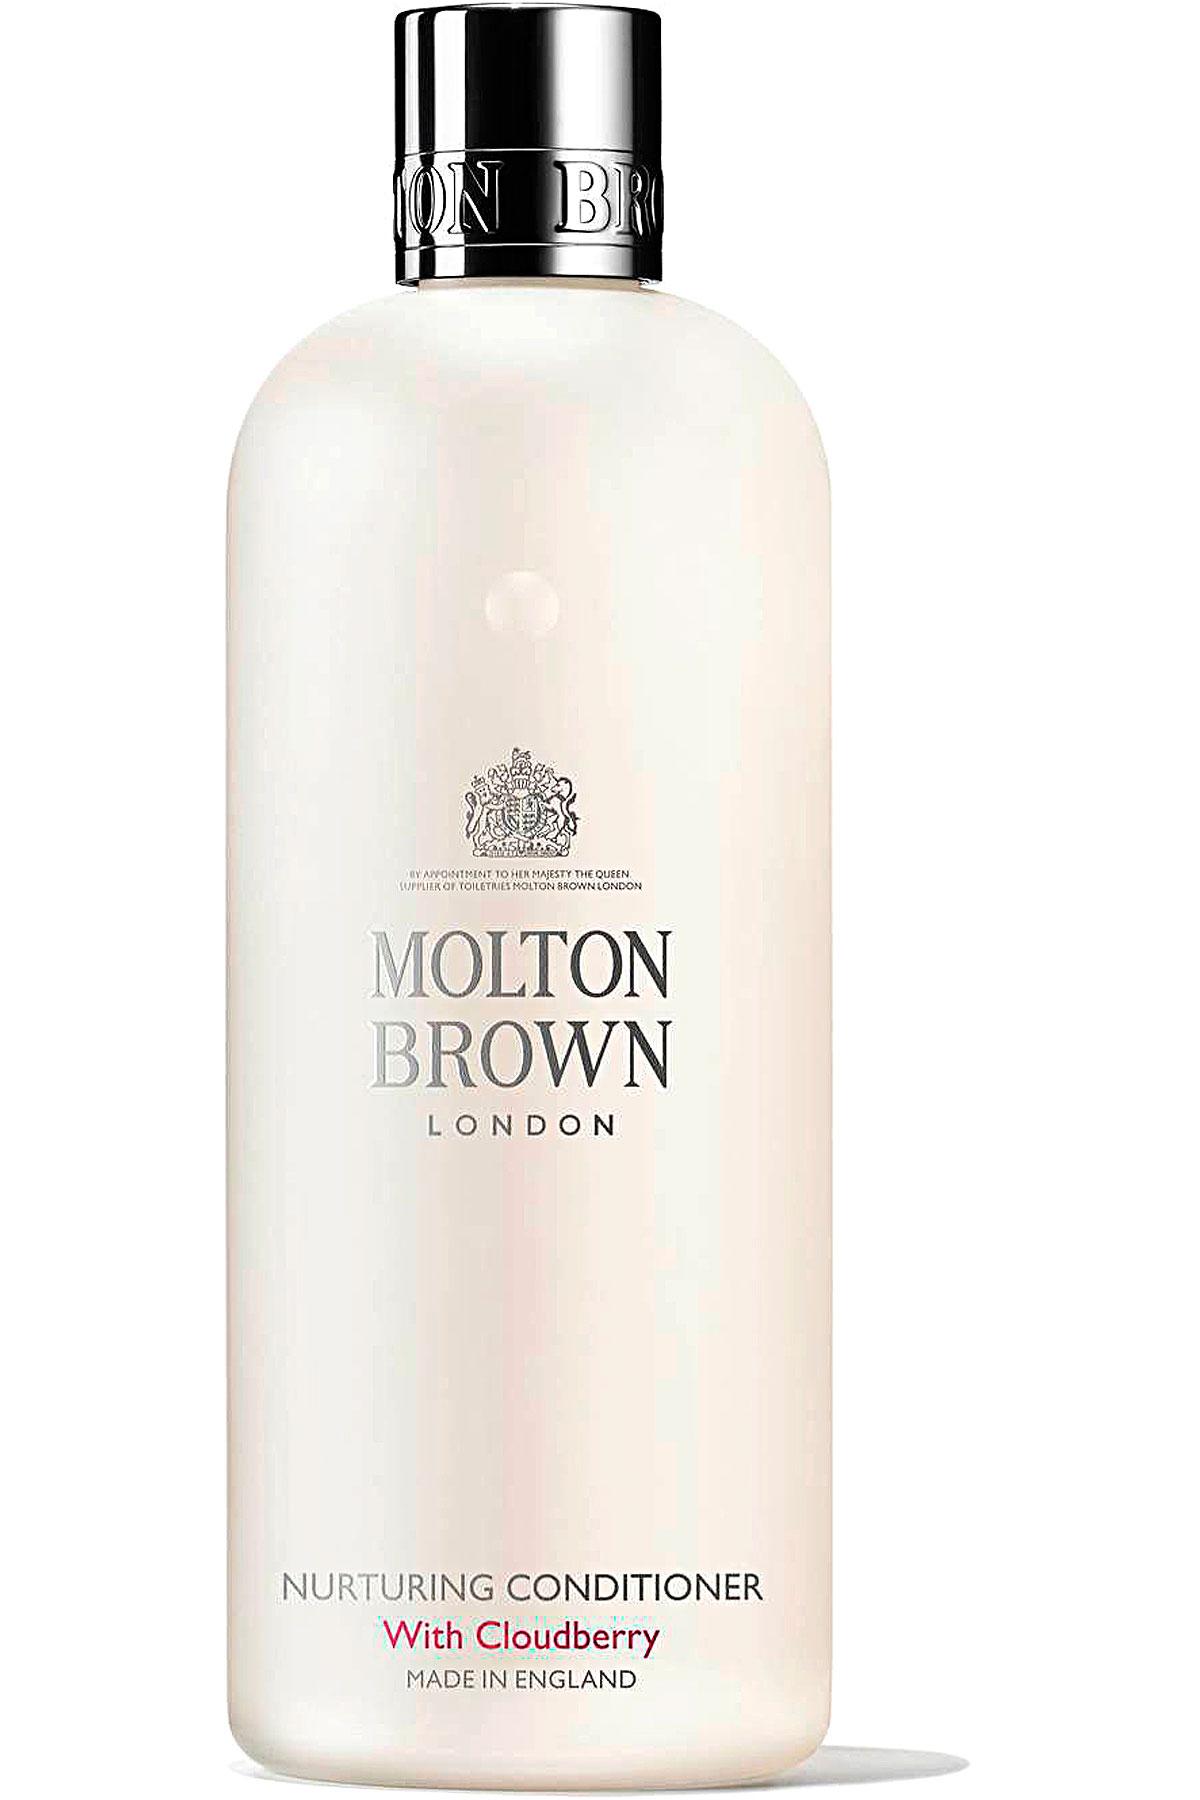 Molton Brown Beauty for Women, Cloudberry - Nurturing Conditioner - 300 Ml, 2019, 300 ml